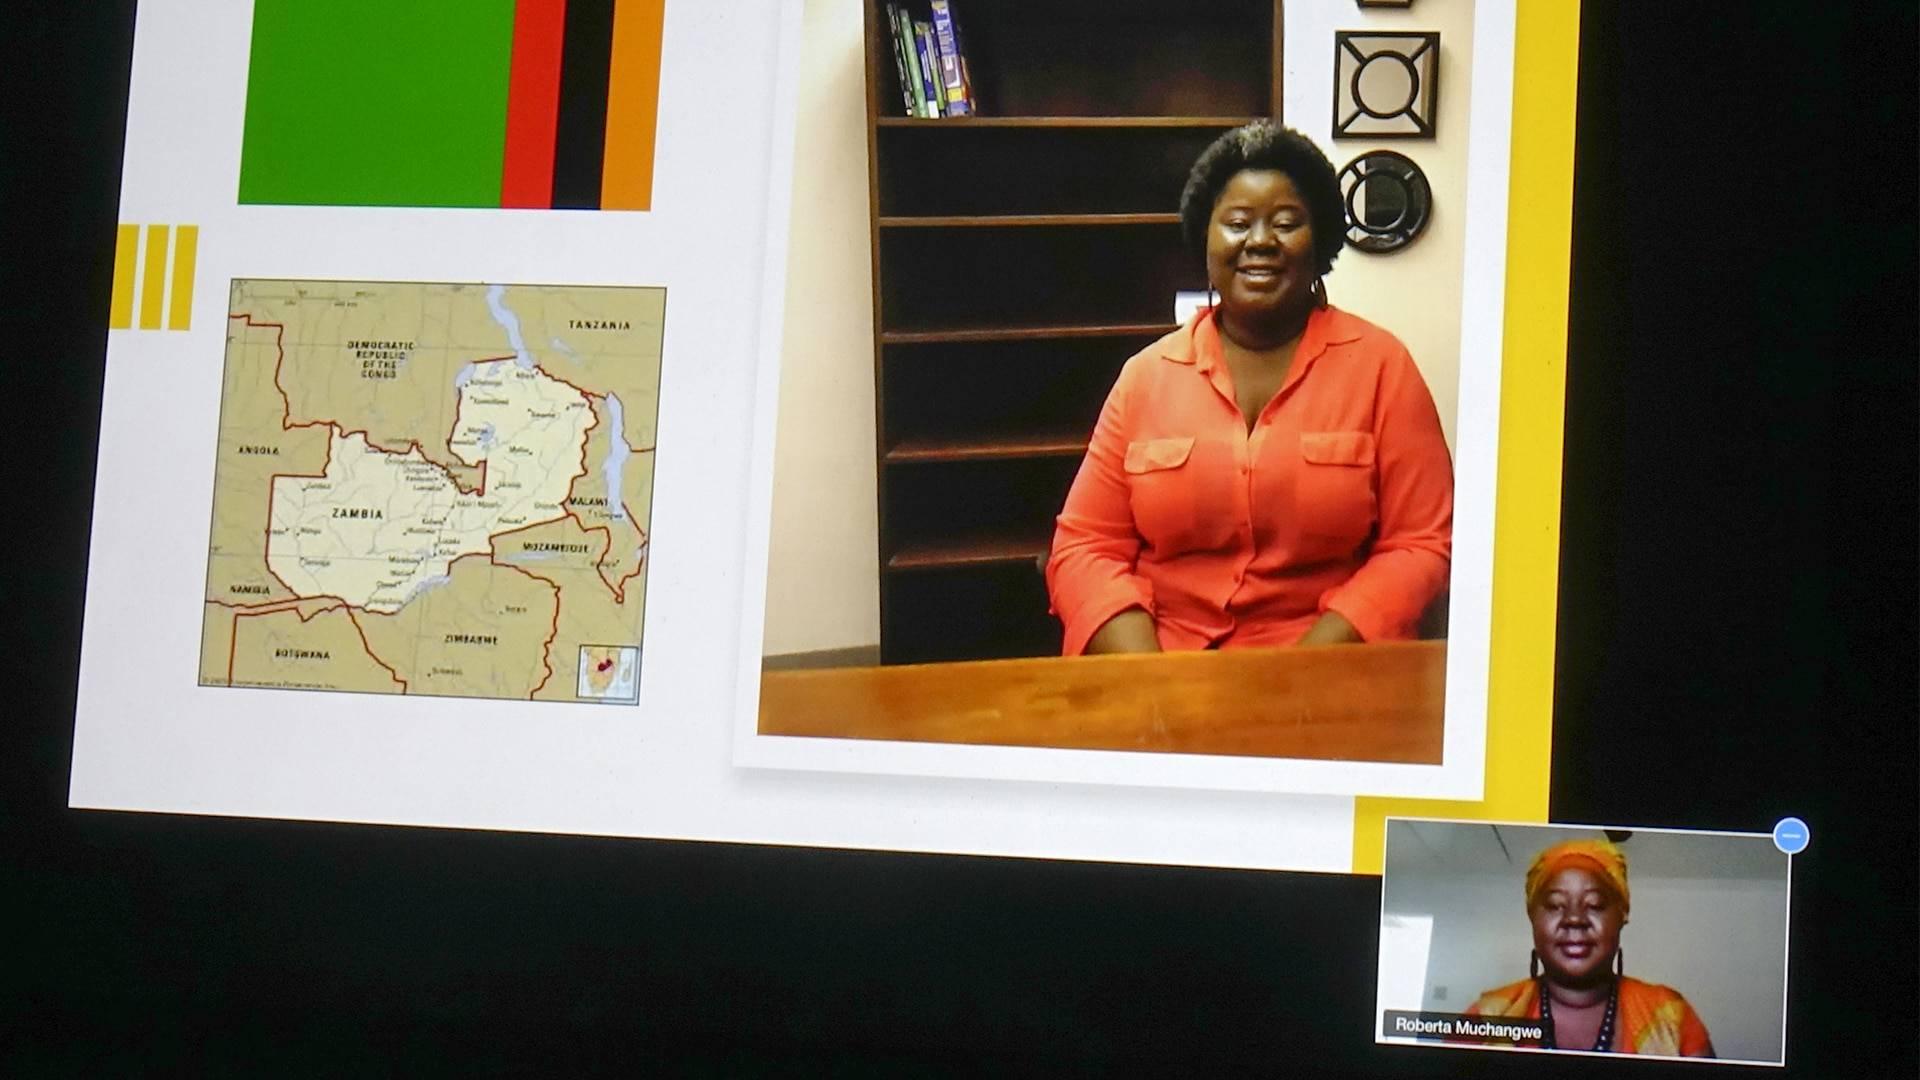 Fulbright scholar Roberta Muchangwe of Zambia